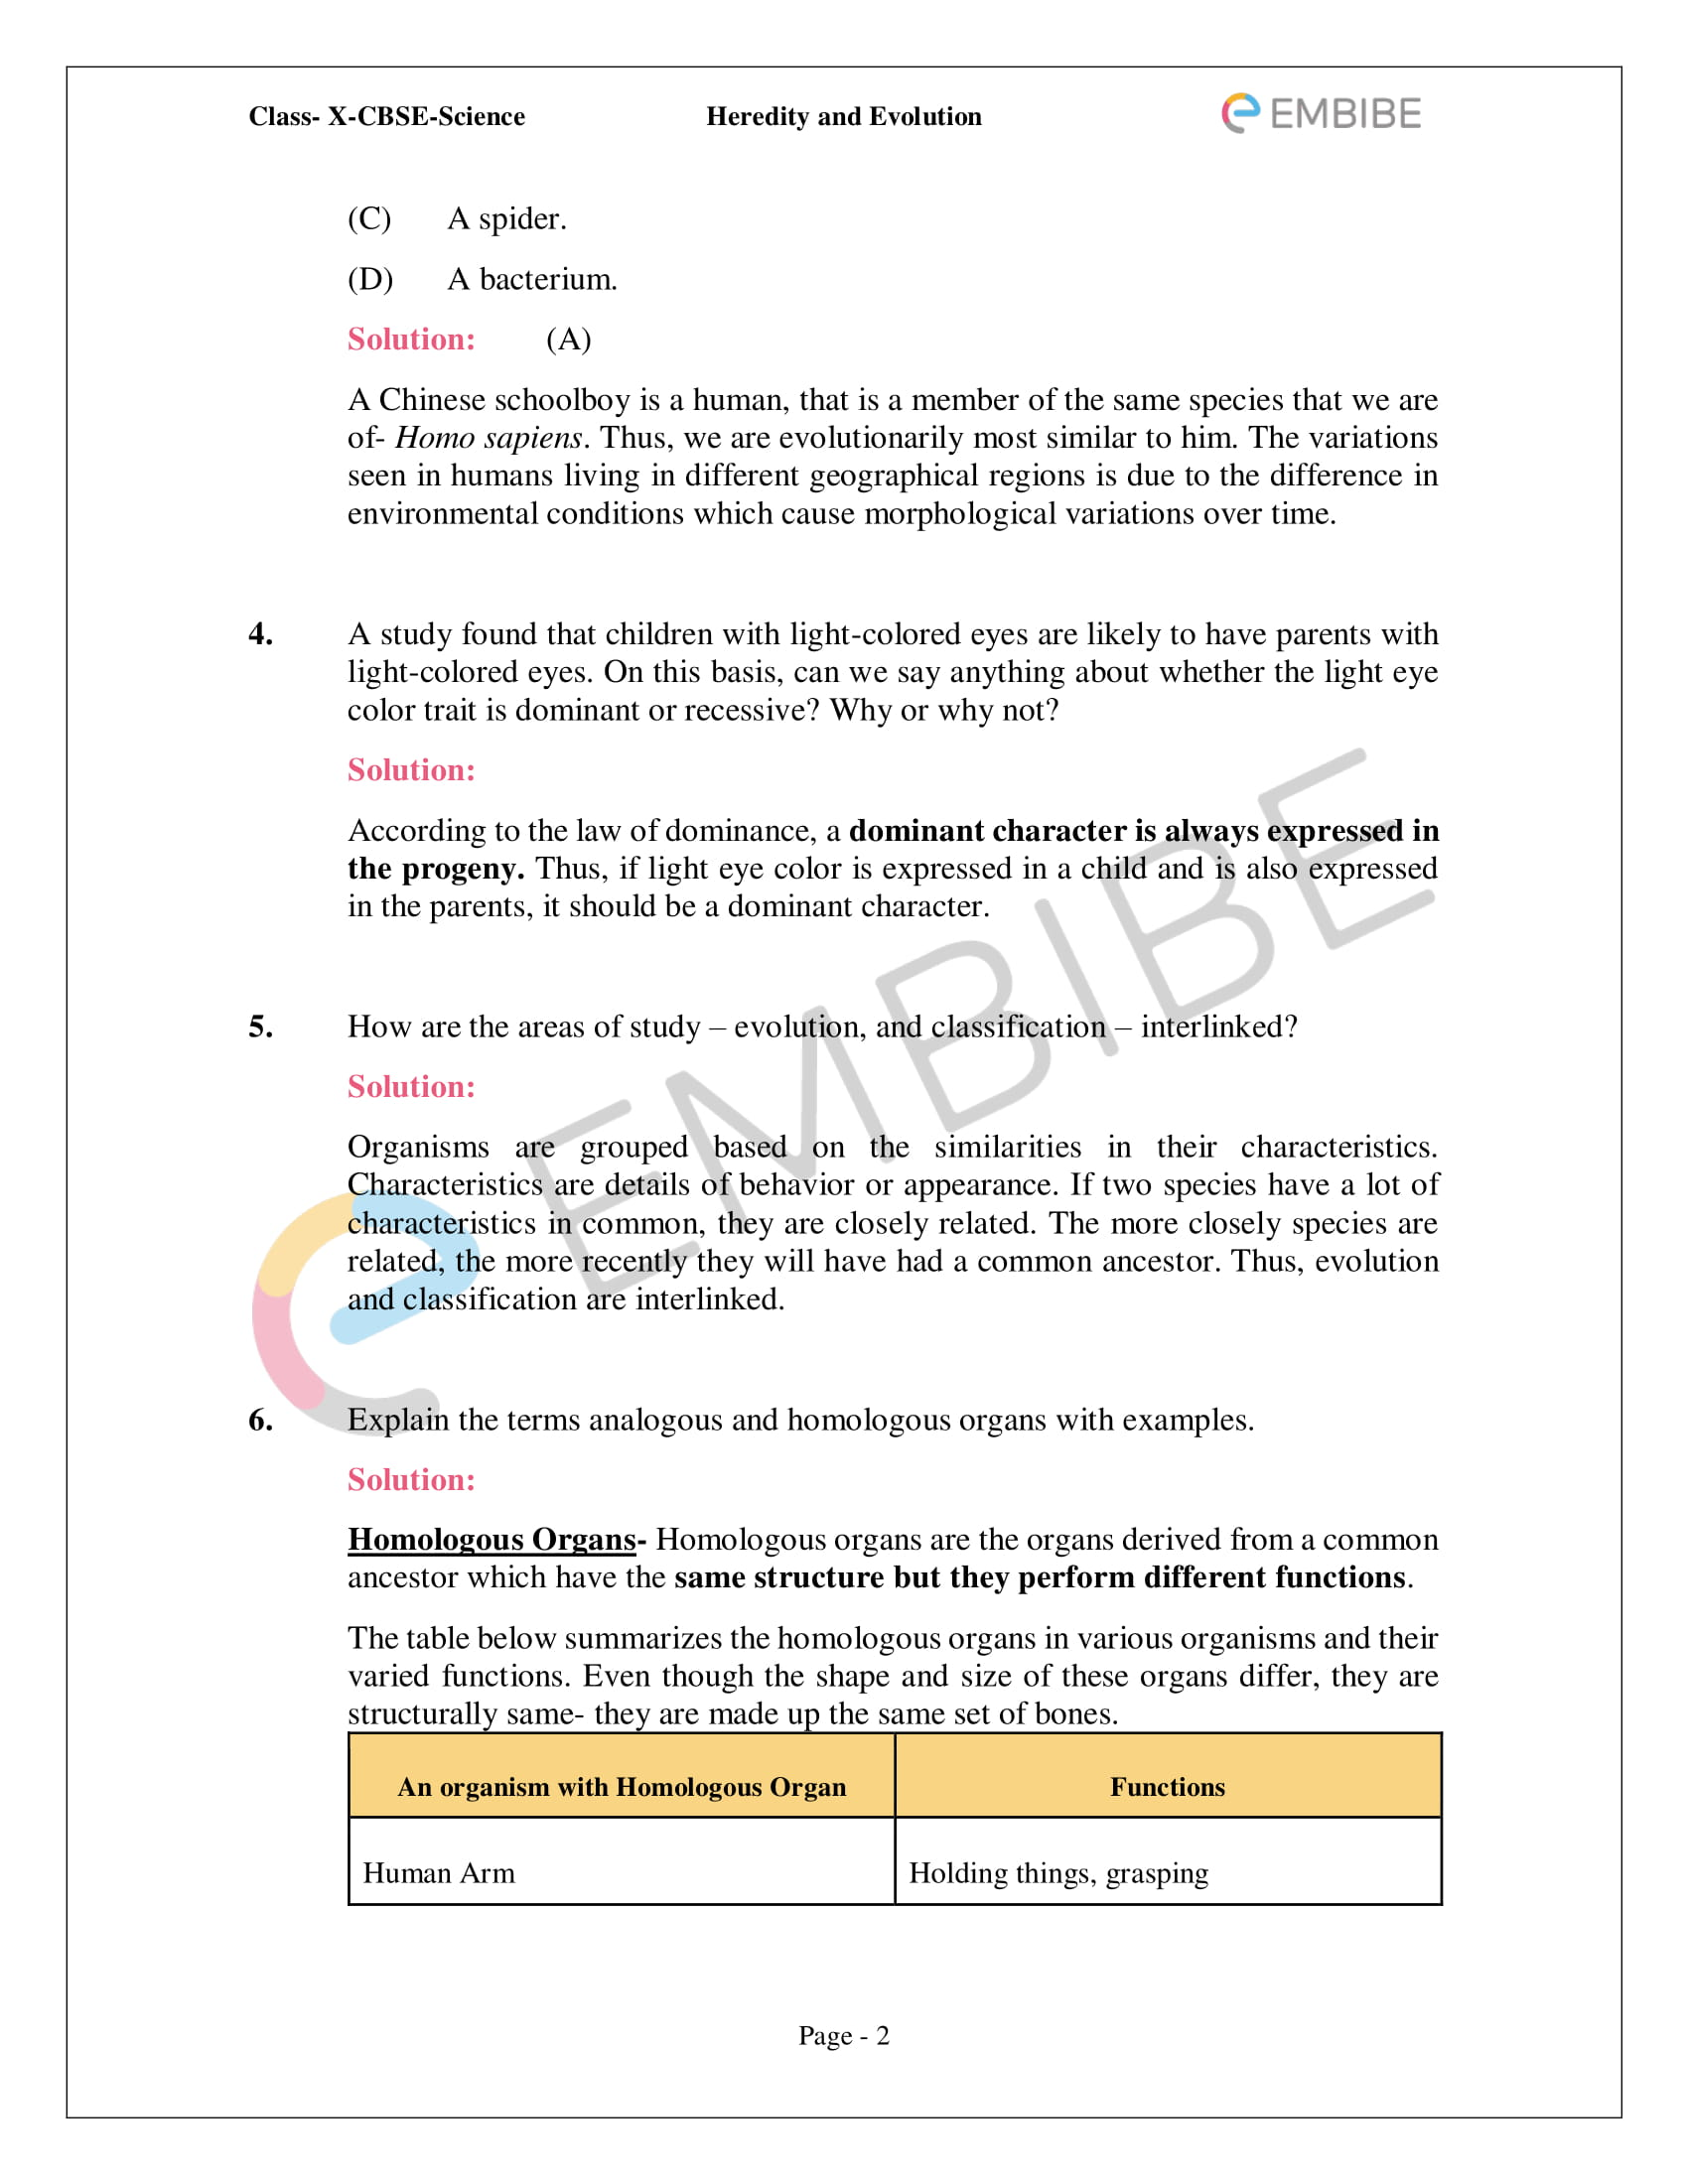 Heredity and Evolution_V3-02